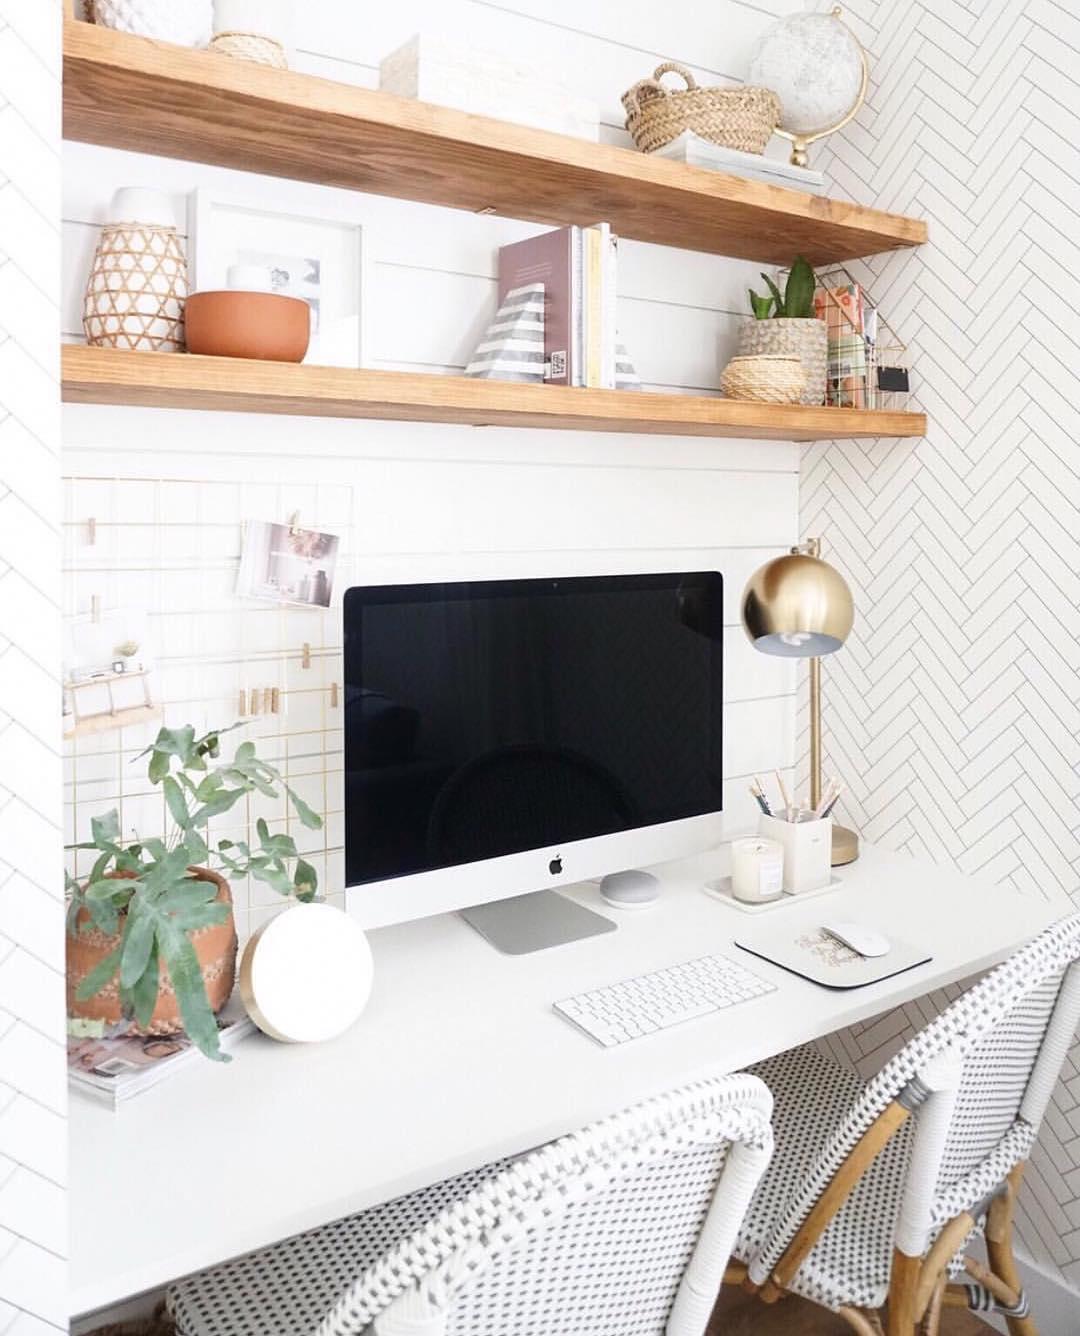 White minimal cloffice with Point de Hongrie wallpaper